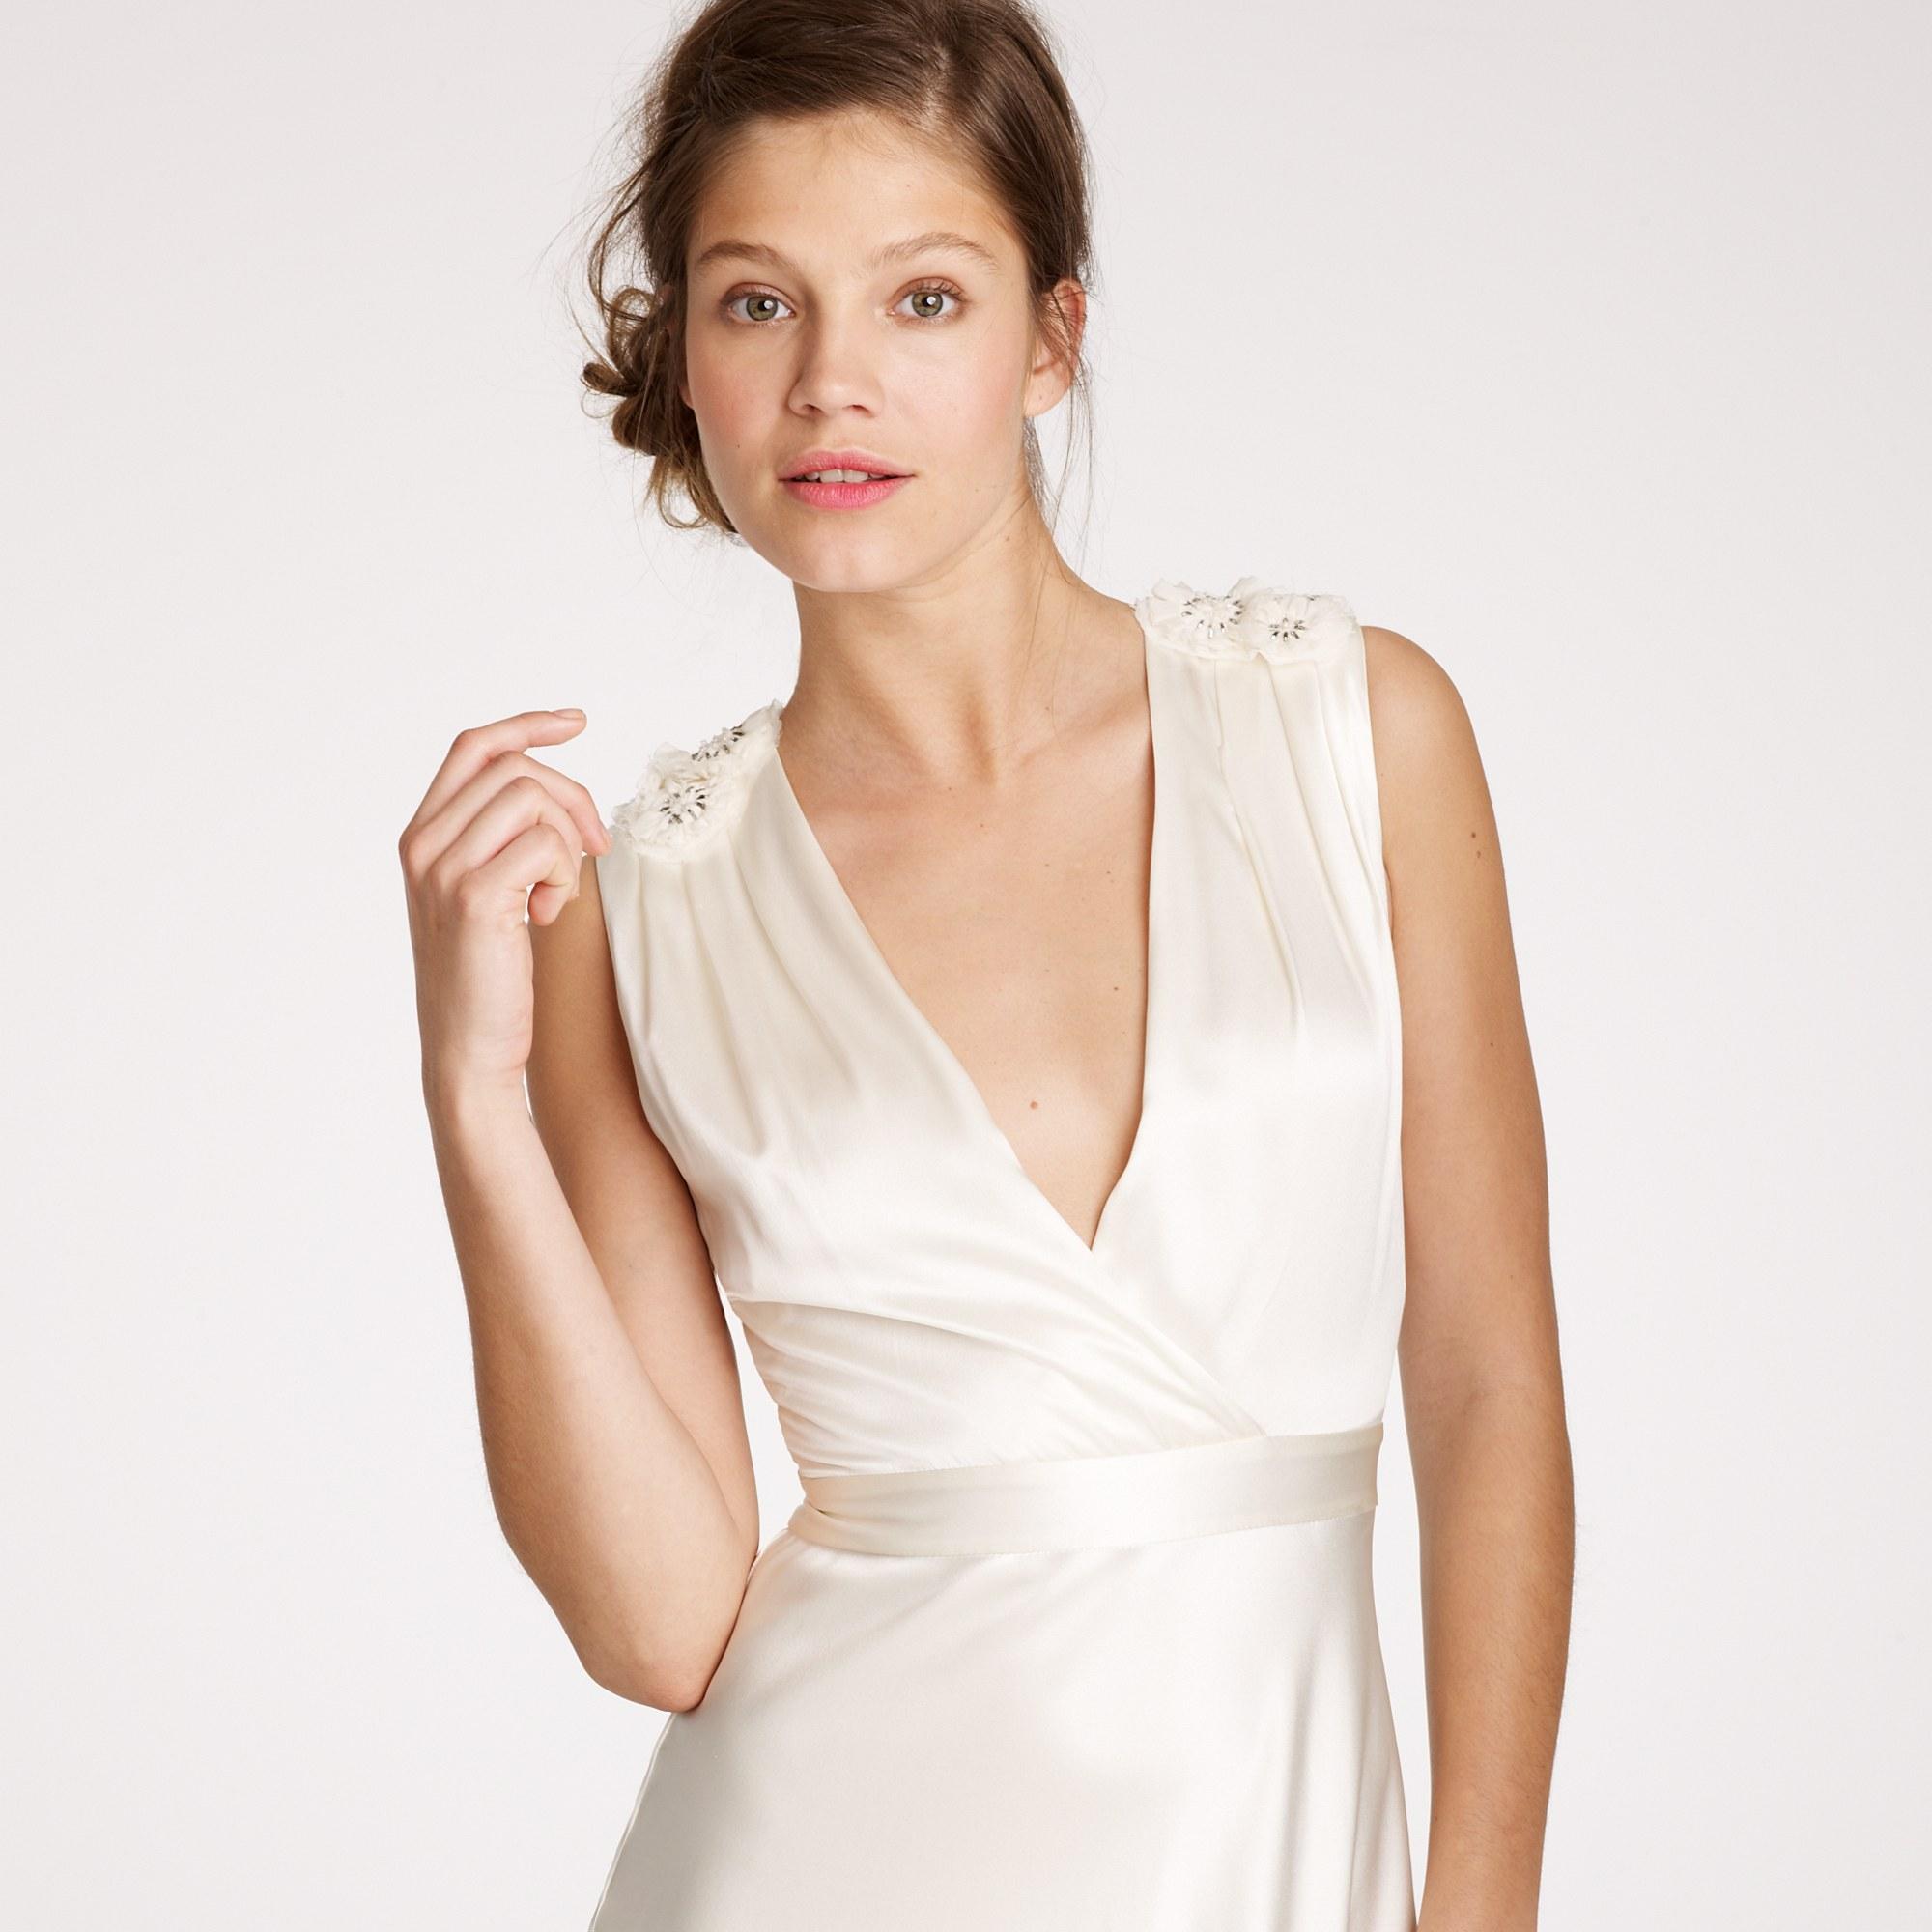 Outstanding J Crew Gown Vignette - Top Wedding Gowns ...